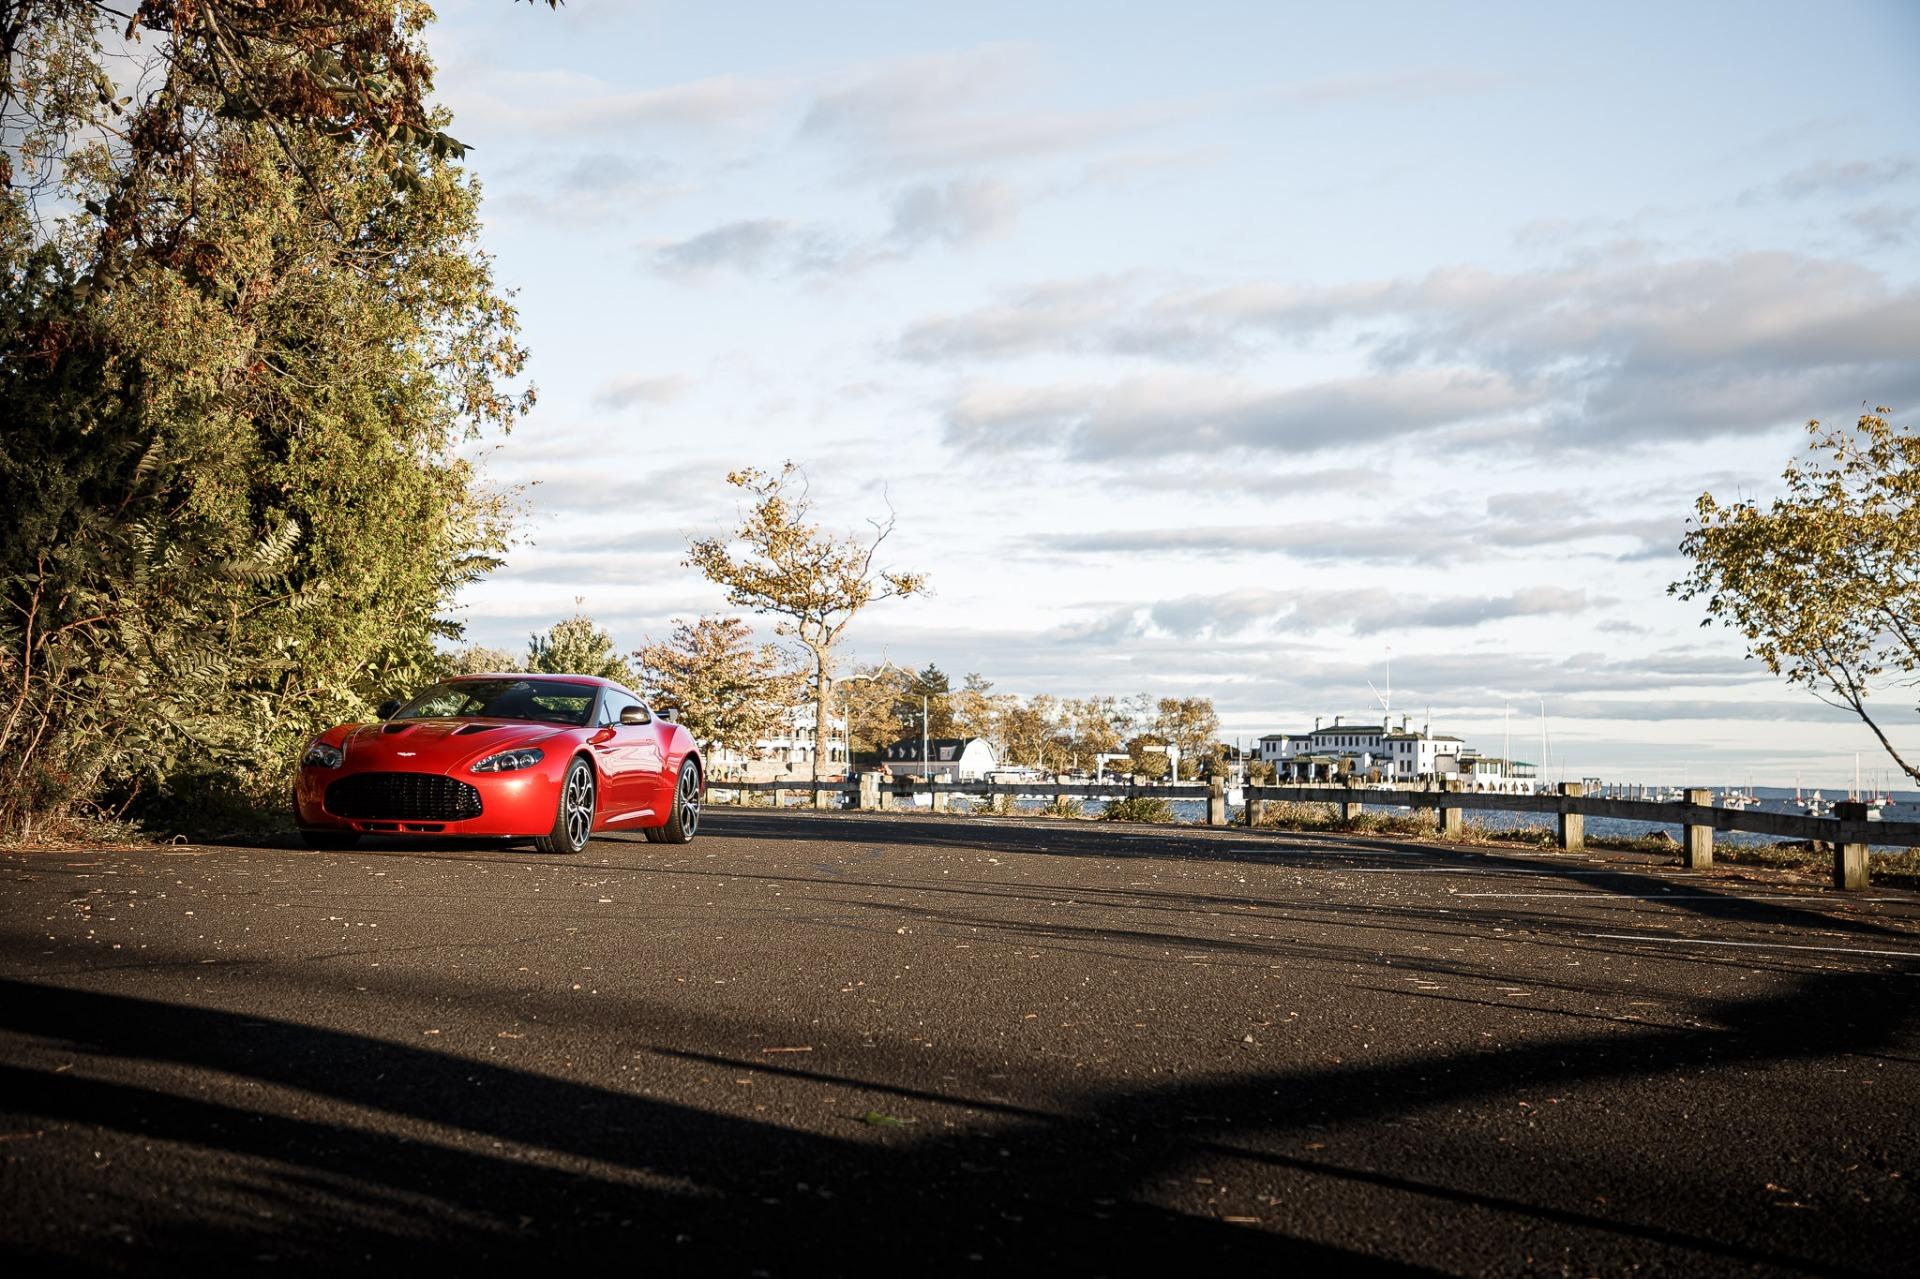 Used 2013 Aston Martin V12 Zagato Coupe For Sale In Westport, CT 3181_p31